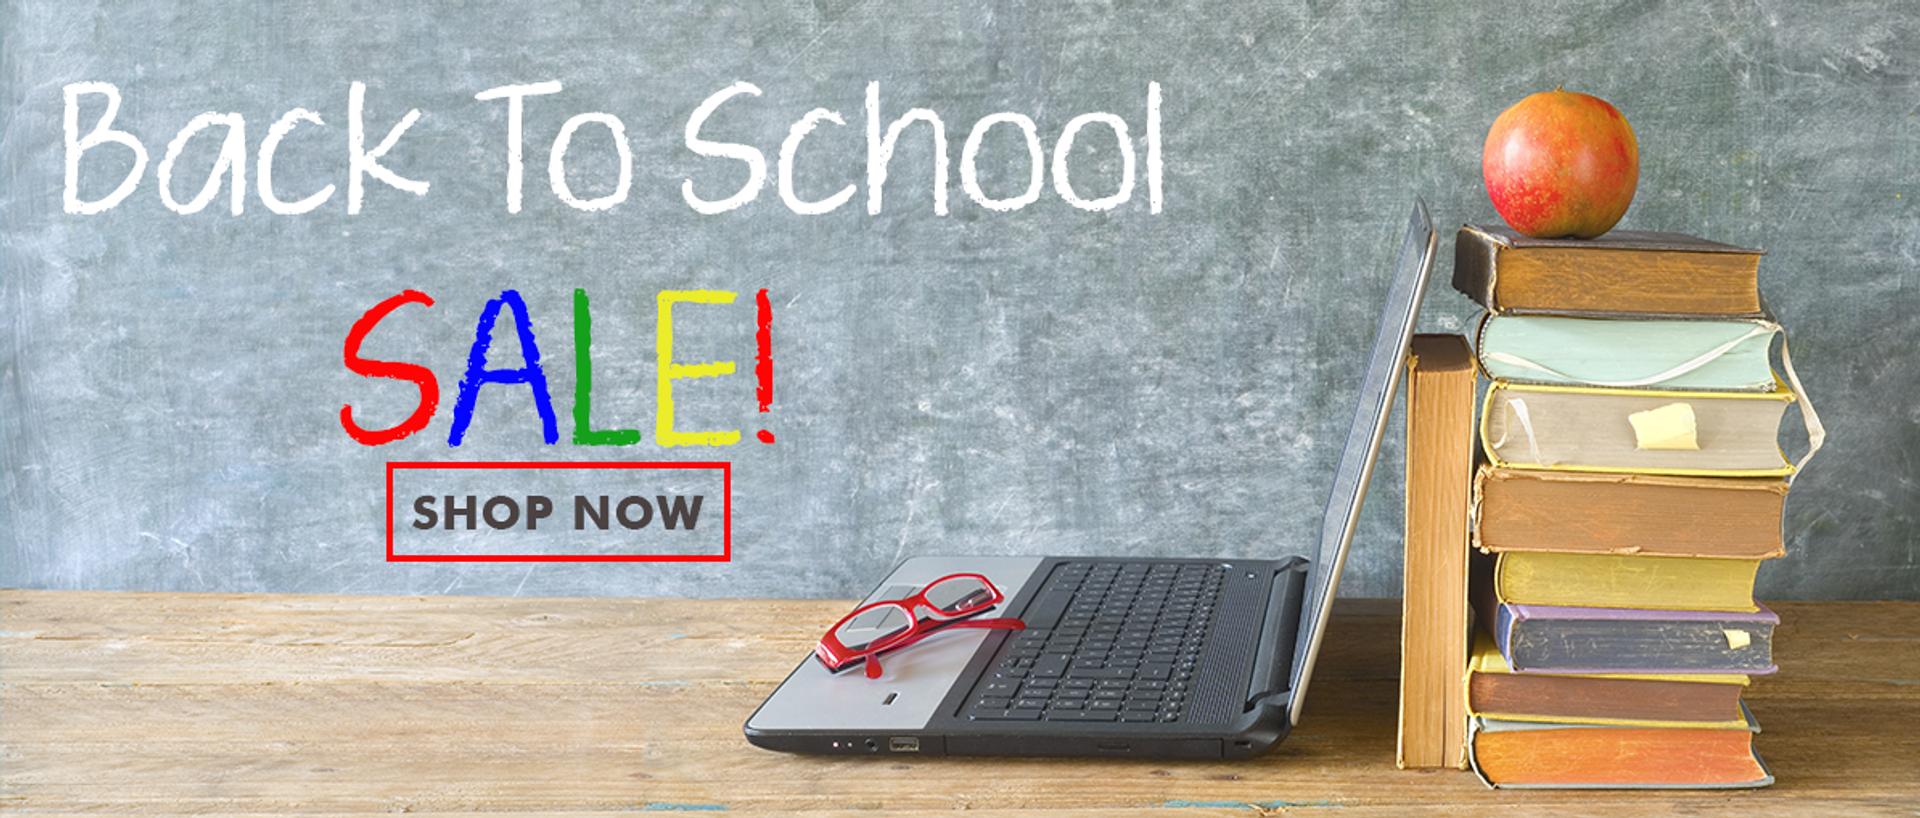 Back To School Laptop Sale!